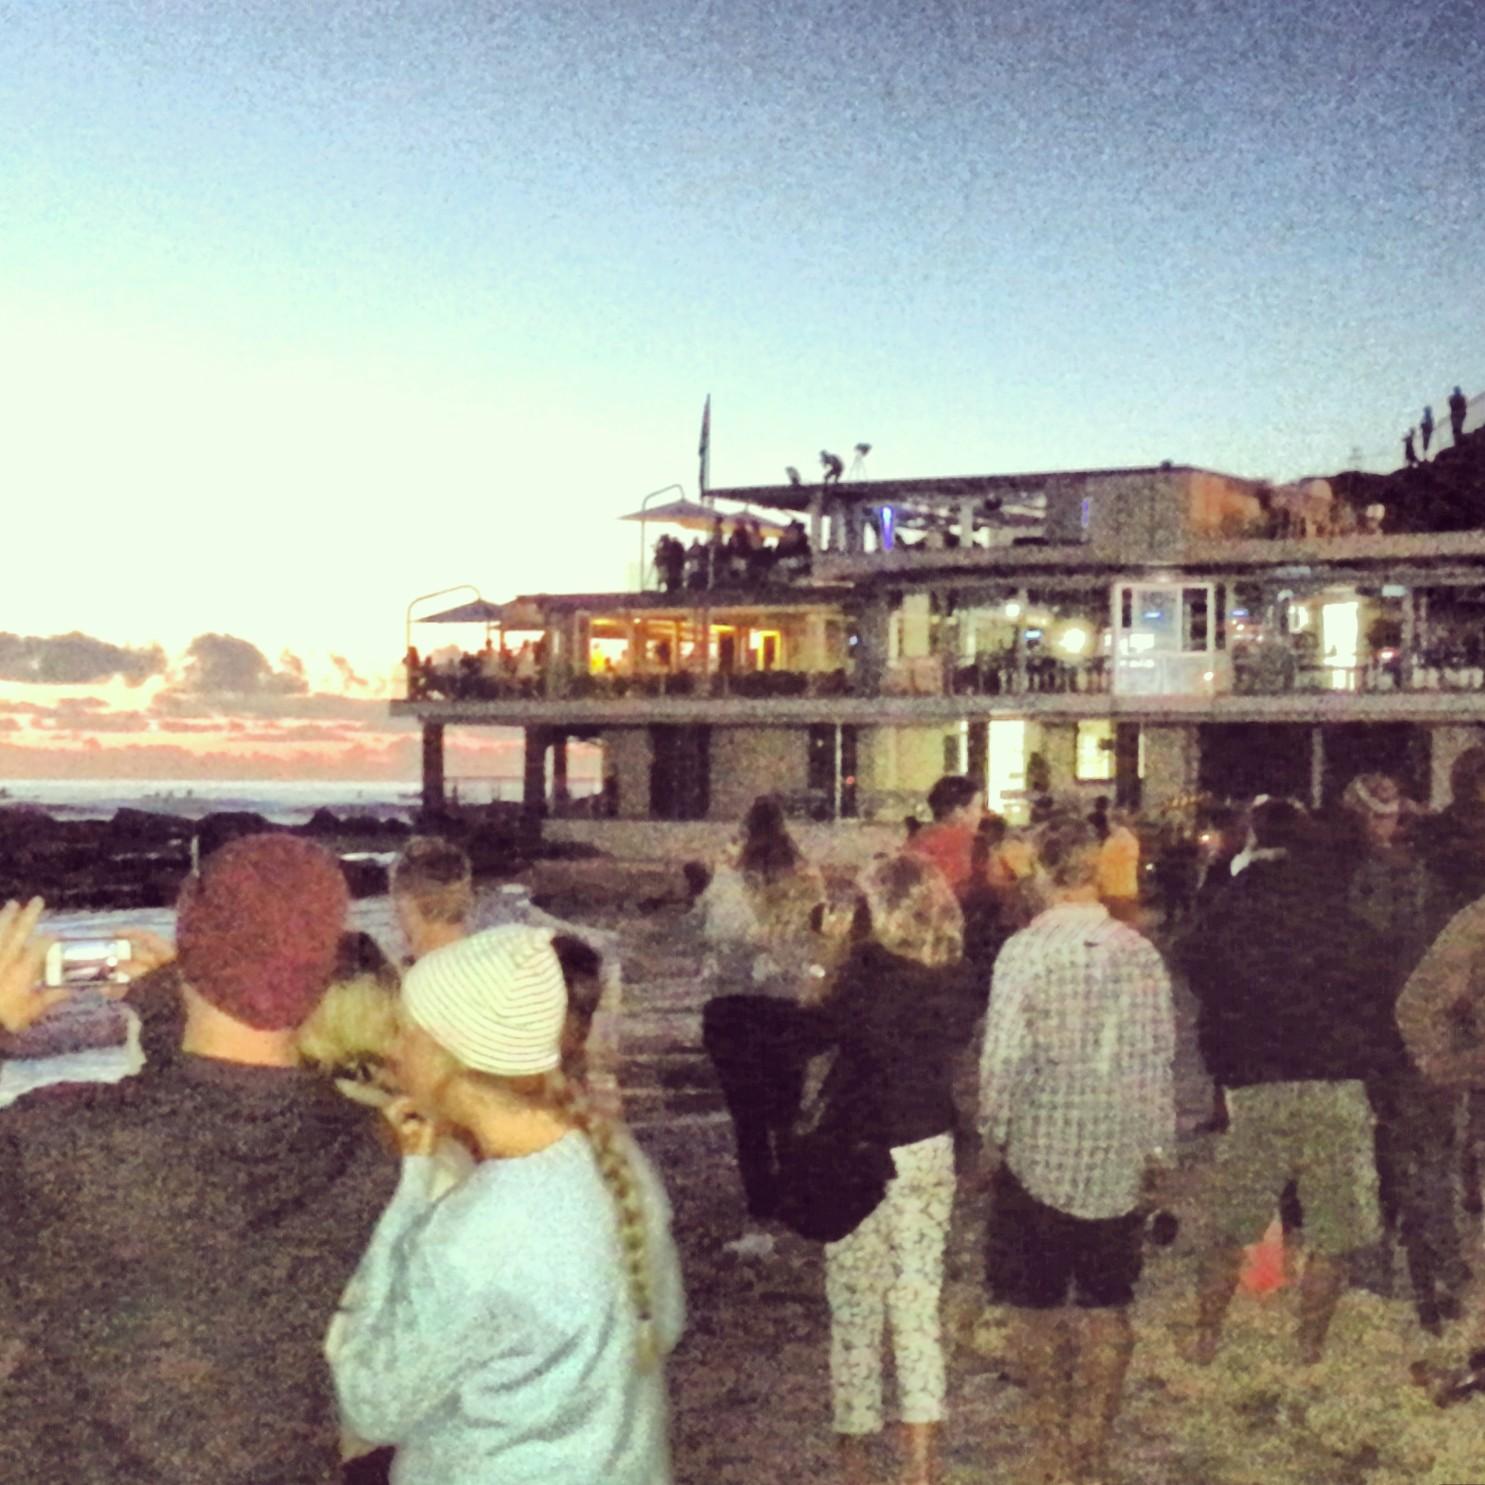 Anzac Day dawn service on Currumbin Beach, the Gold Coast, Queensland, Australia on Mallory on Travel adventure, adventure travel, photography malloryontravel_anzac_sunrise